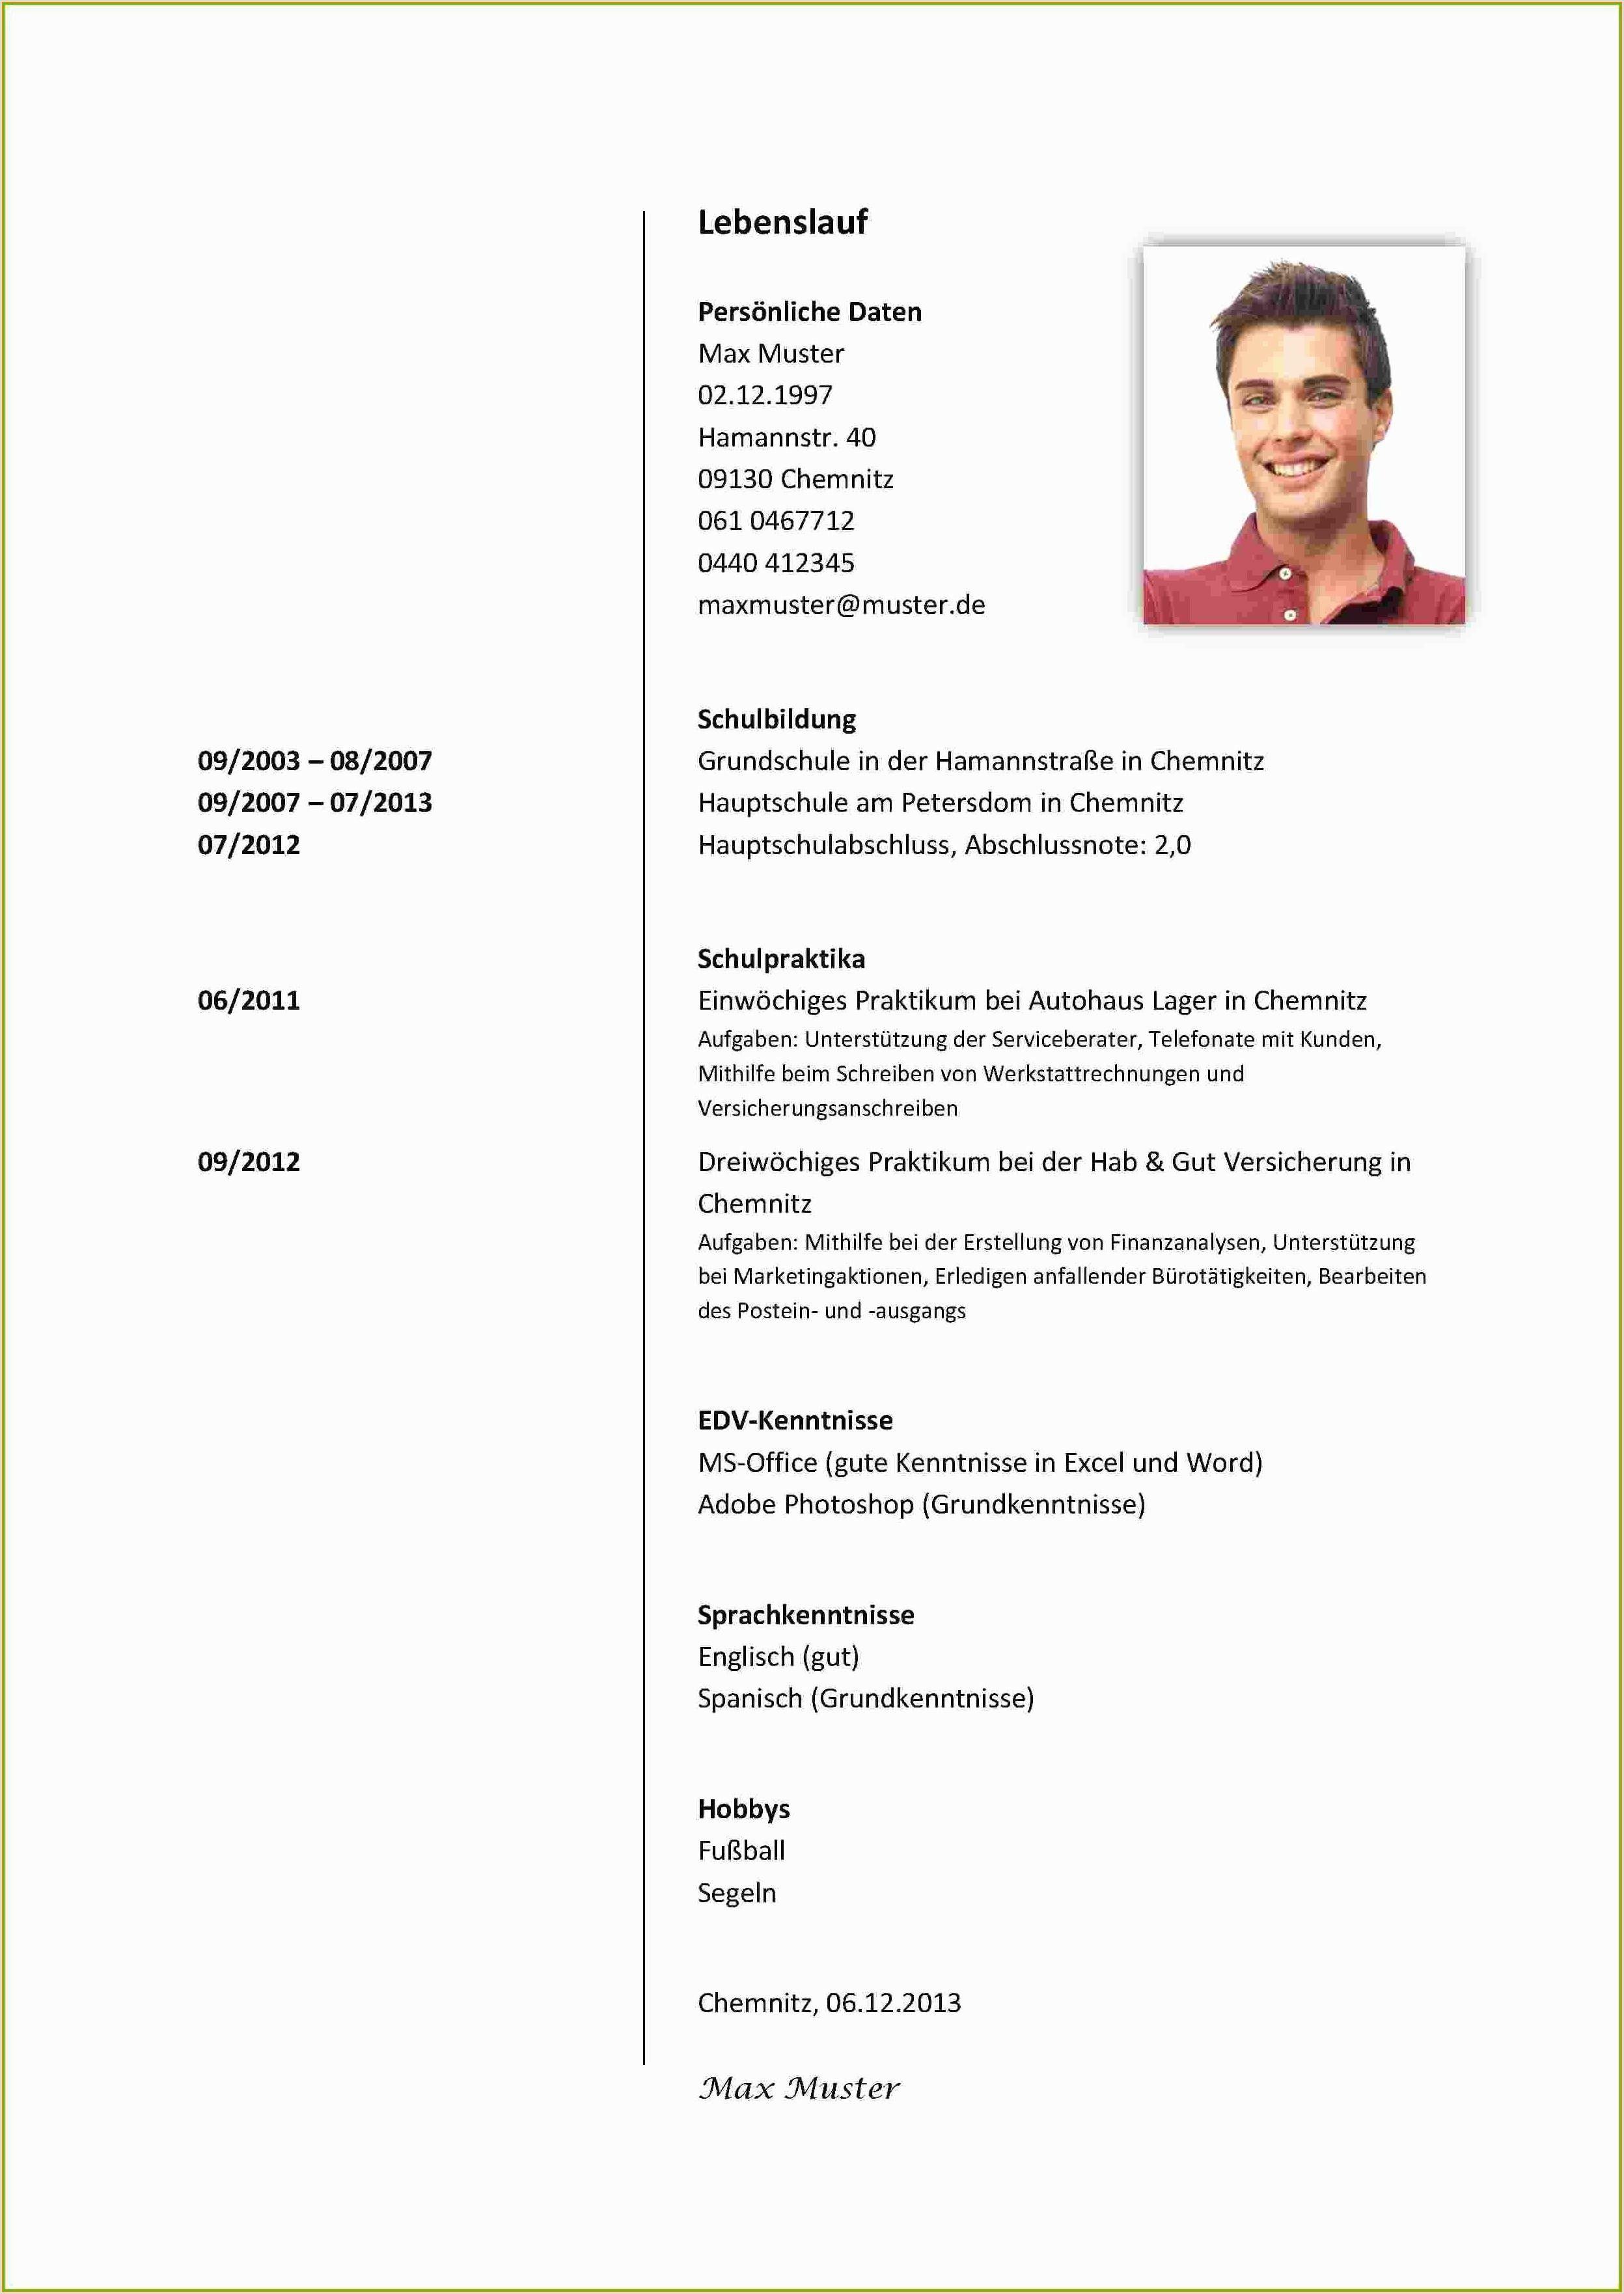 Lebenslauf Vorlage Fur Schuler Praktikum Resume Template Free Downloadable Lebenslauf Vorlage Fur Schule In 2020 Vorlagen Lebenslauf Lebenslauf Lebenslauf Muster